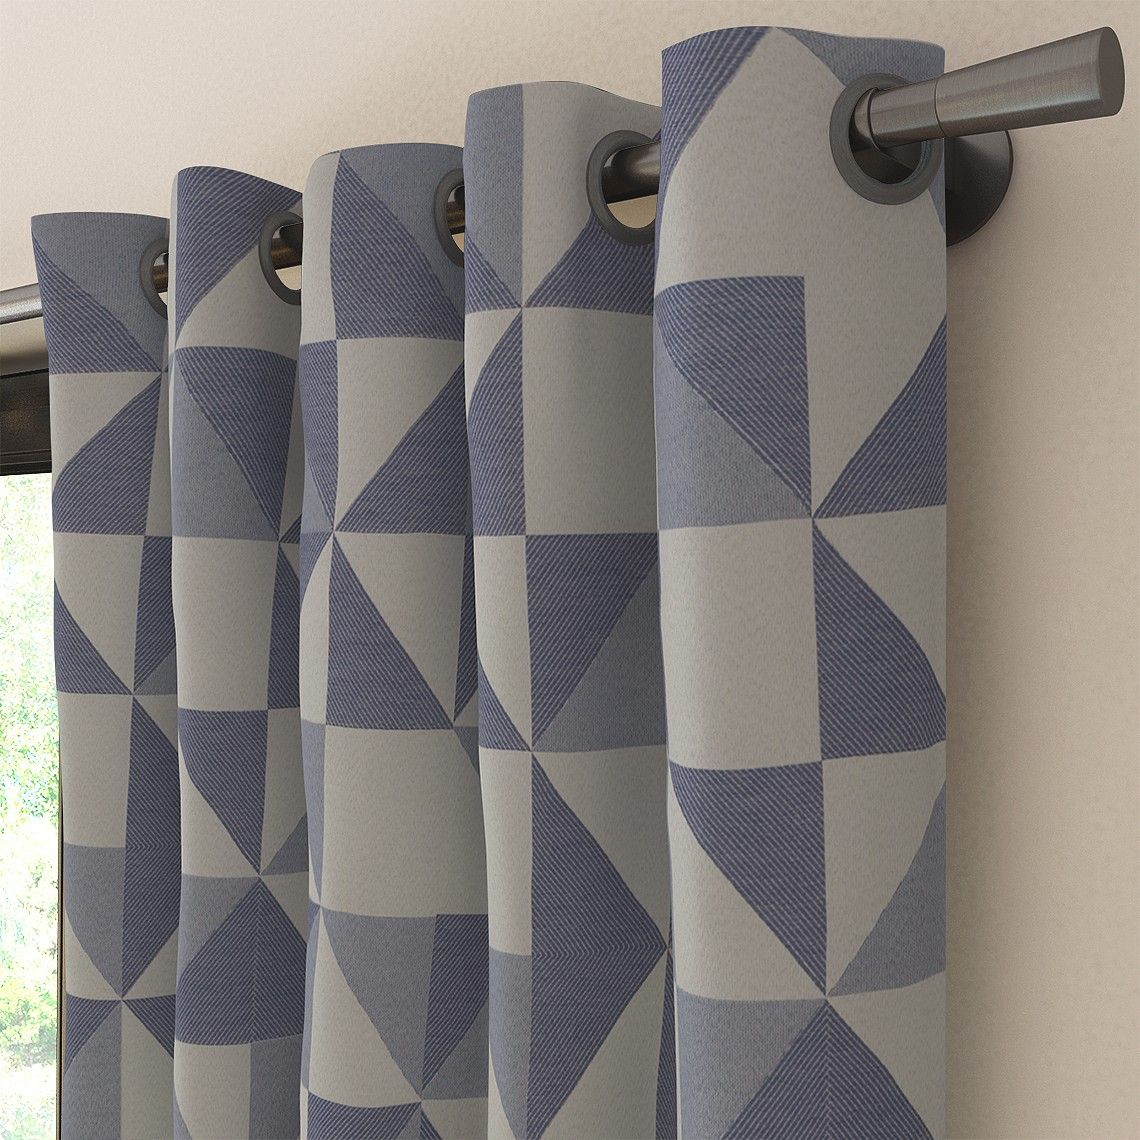 tissu faience motif g om trique gris anthracite saint. Black Bedroom Furniture Sets. Home Design Ideas